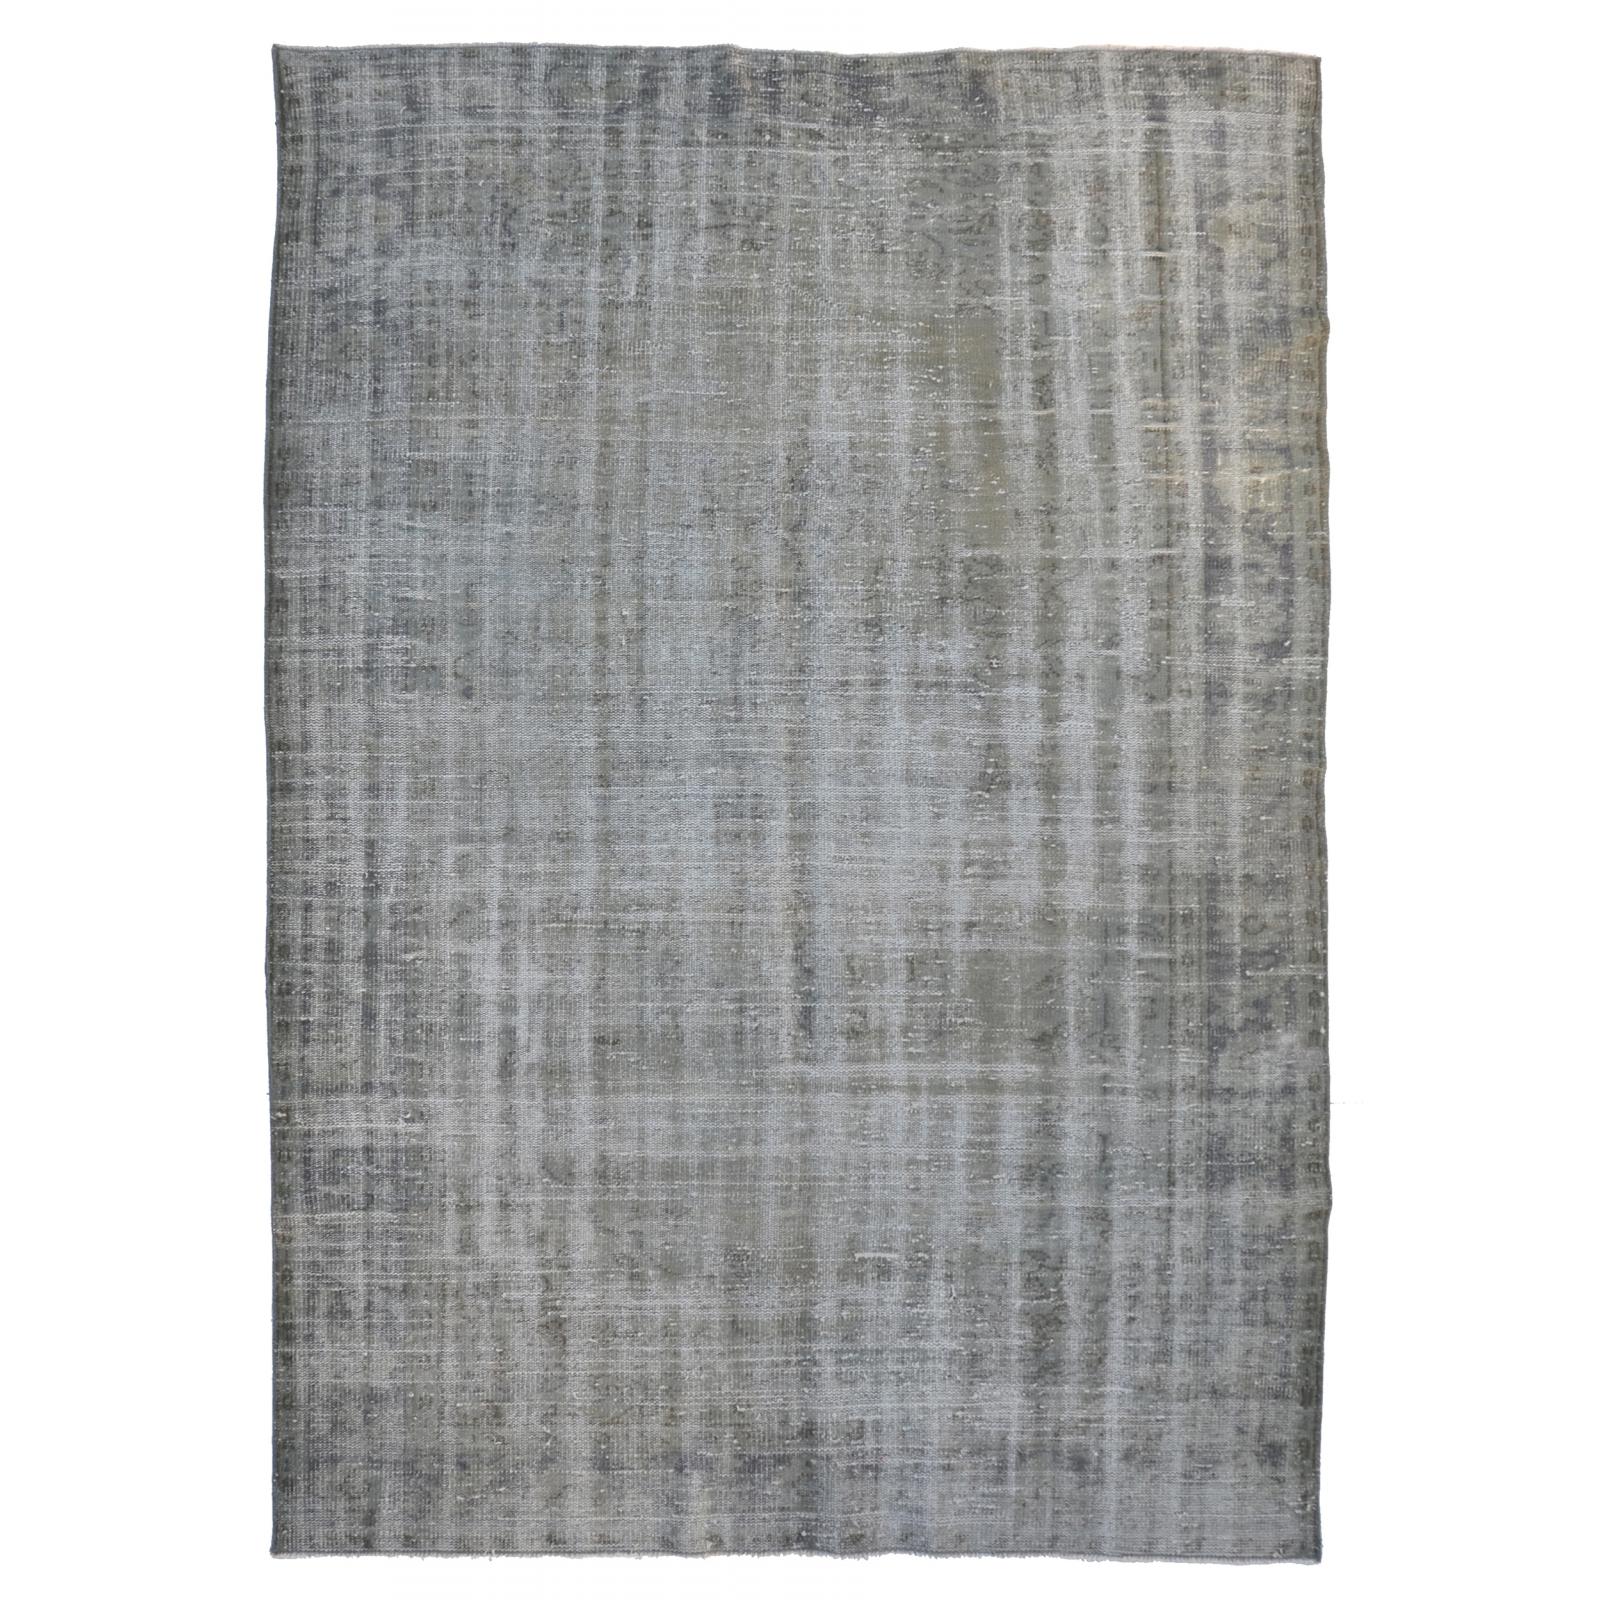 gris vintage tapis recolor s 286x185cm. Black Bedroom Furniture Sets. Home Design Ideas